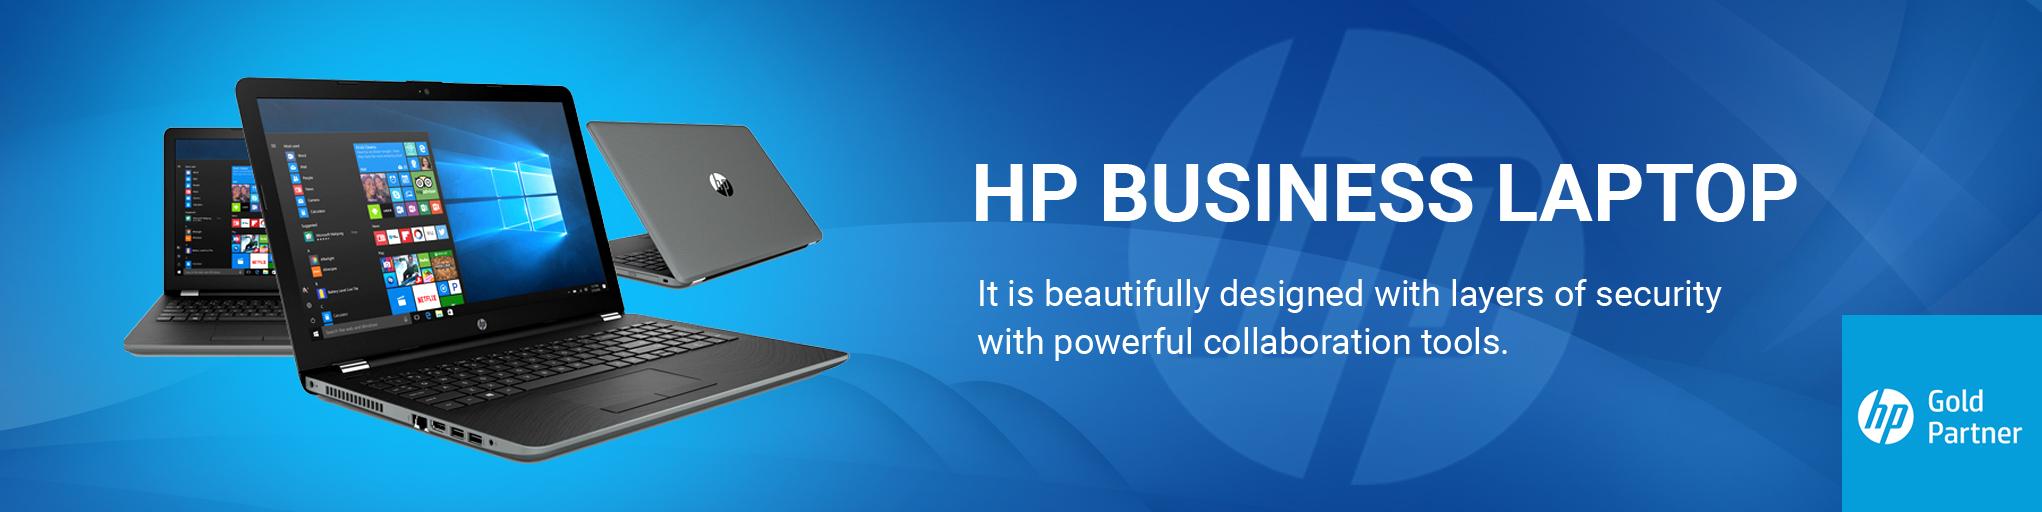 hp business laptop 1